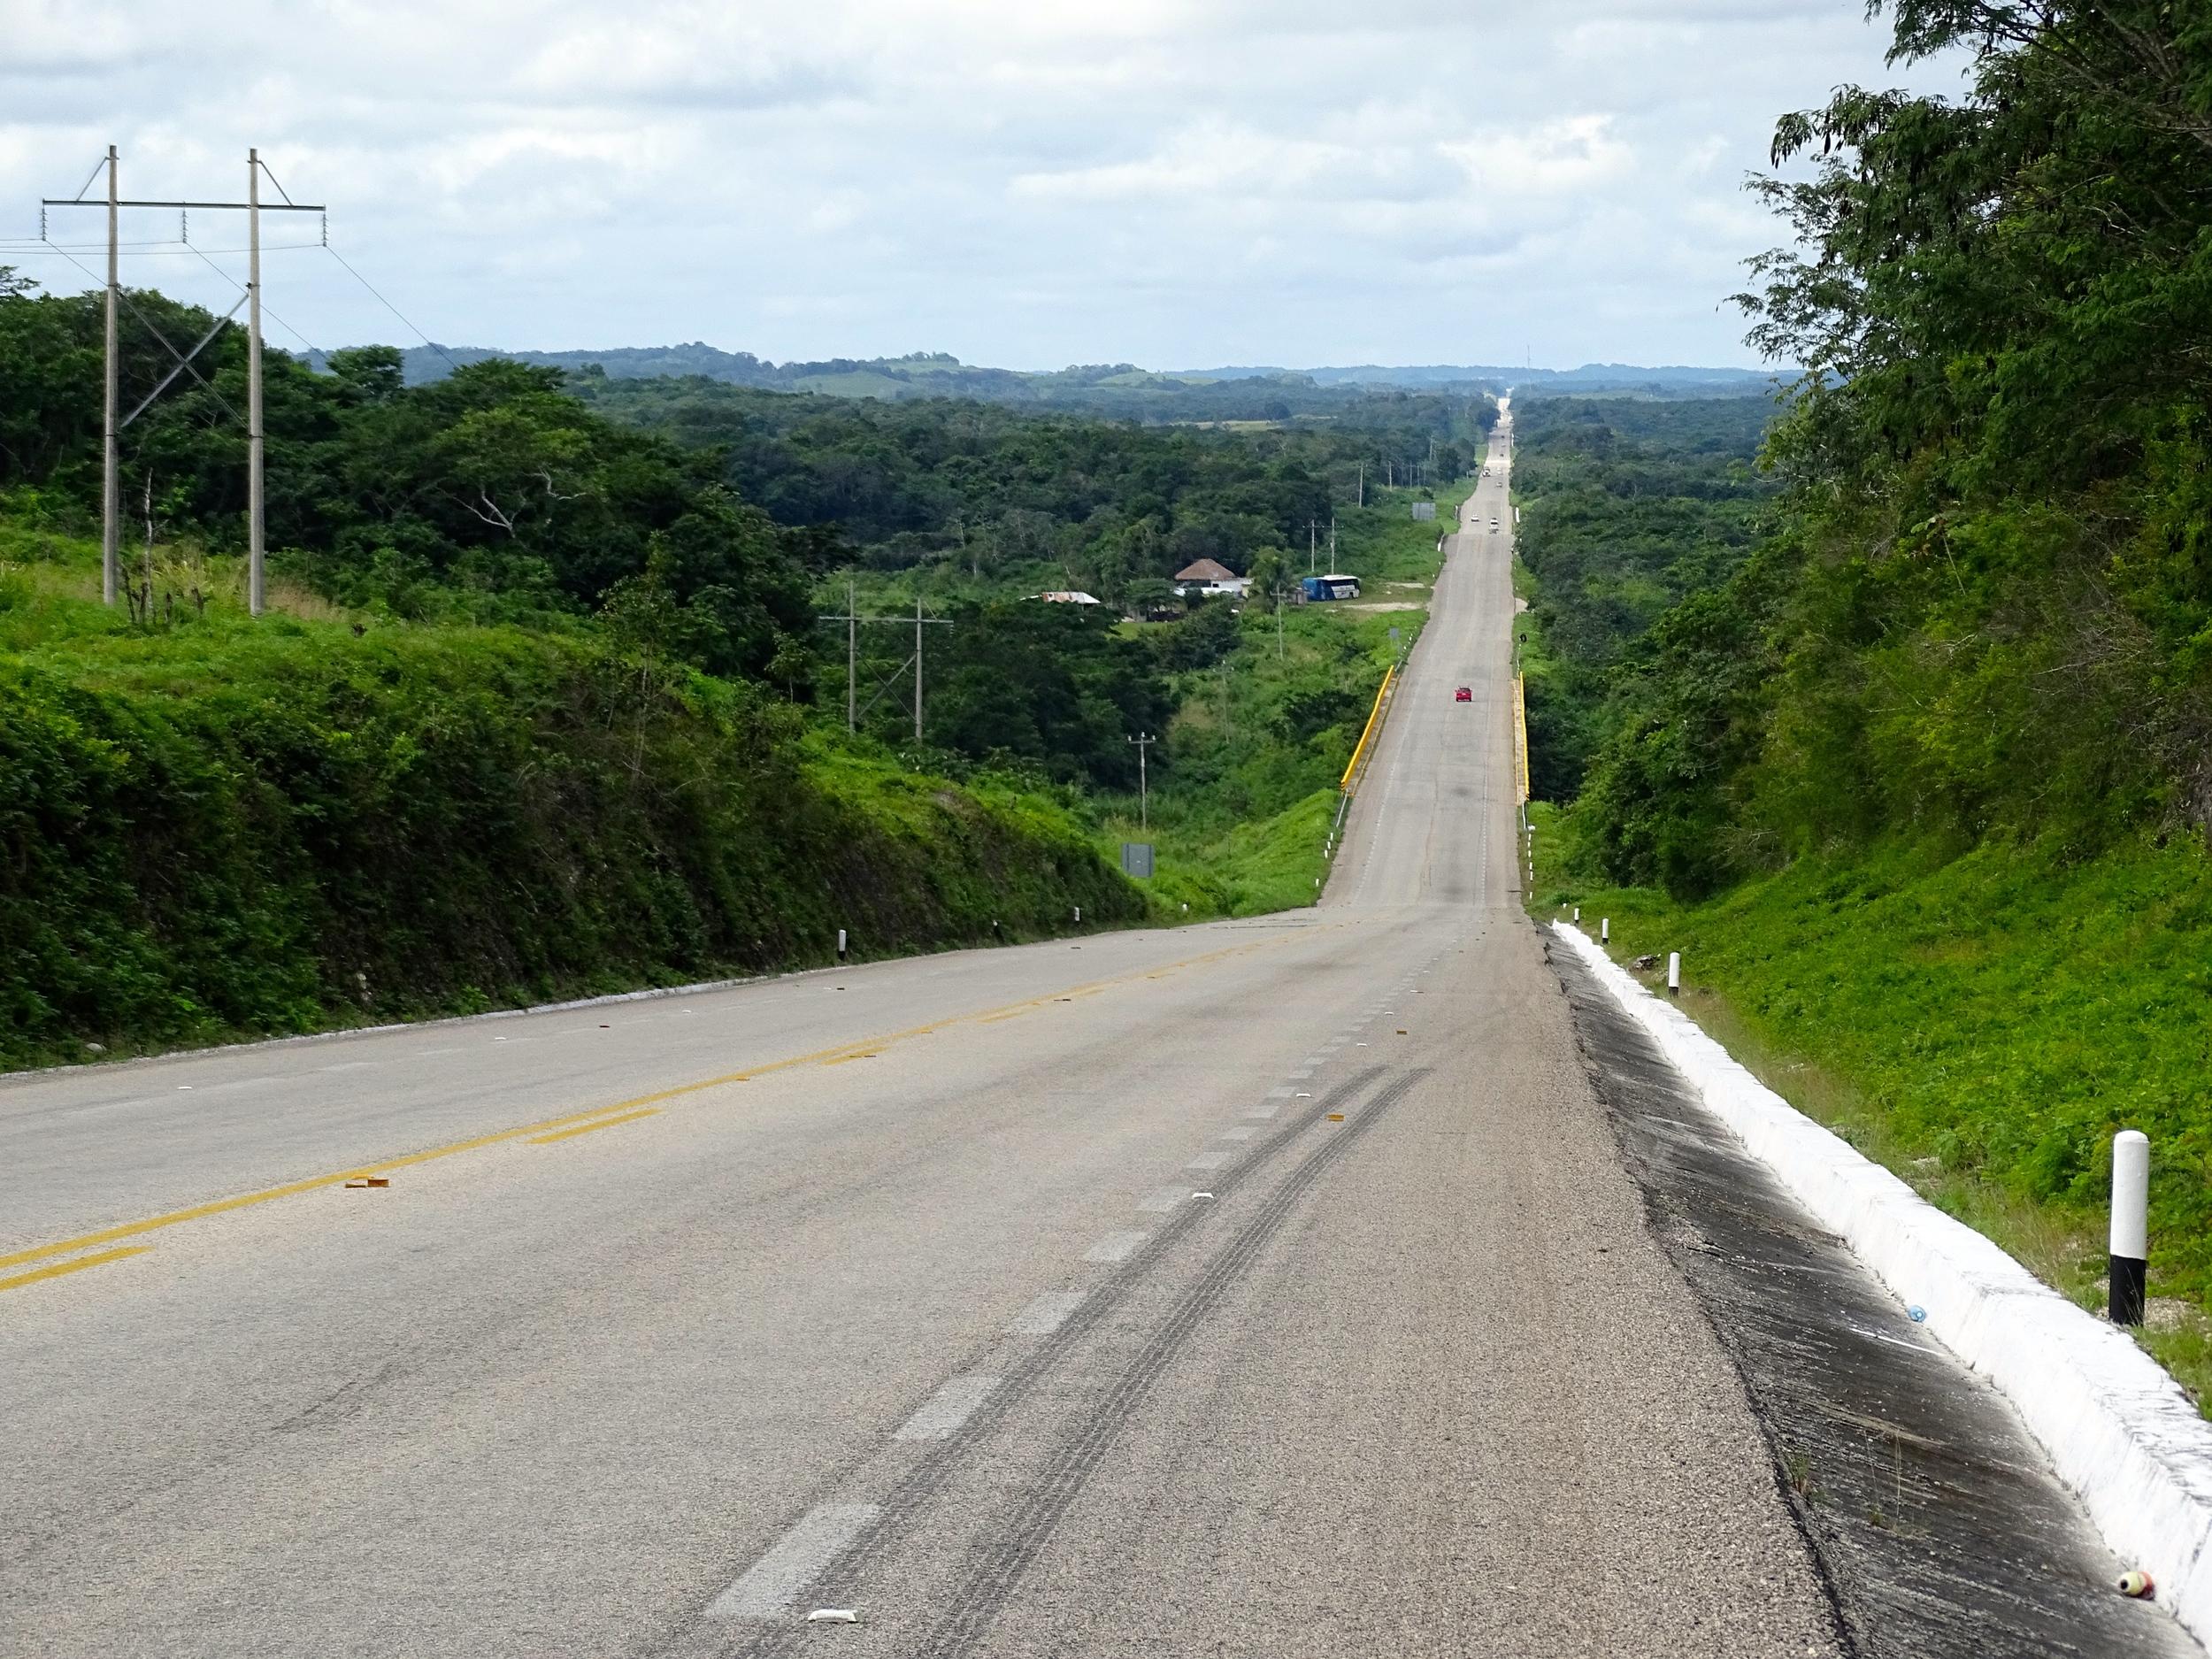 The road toward Villahermosa, our next destination.